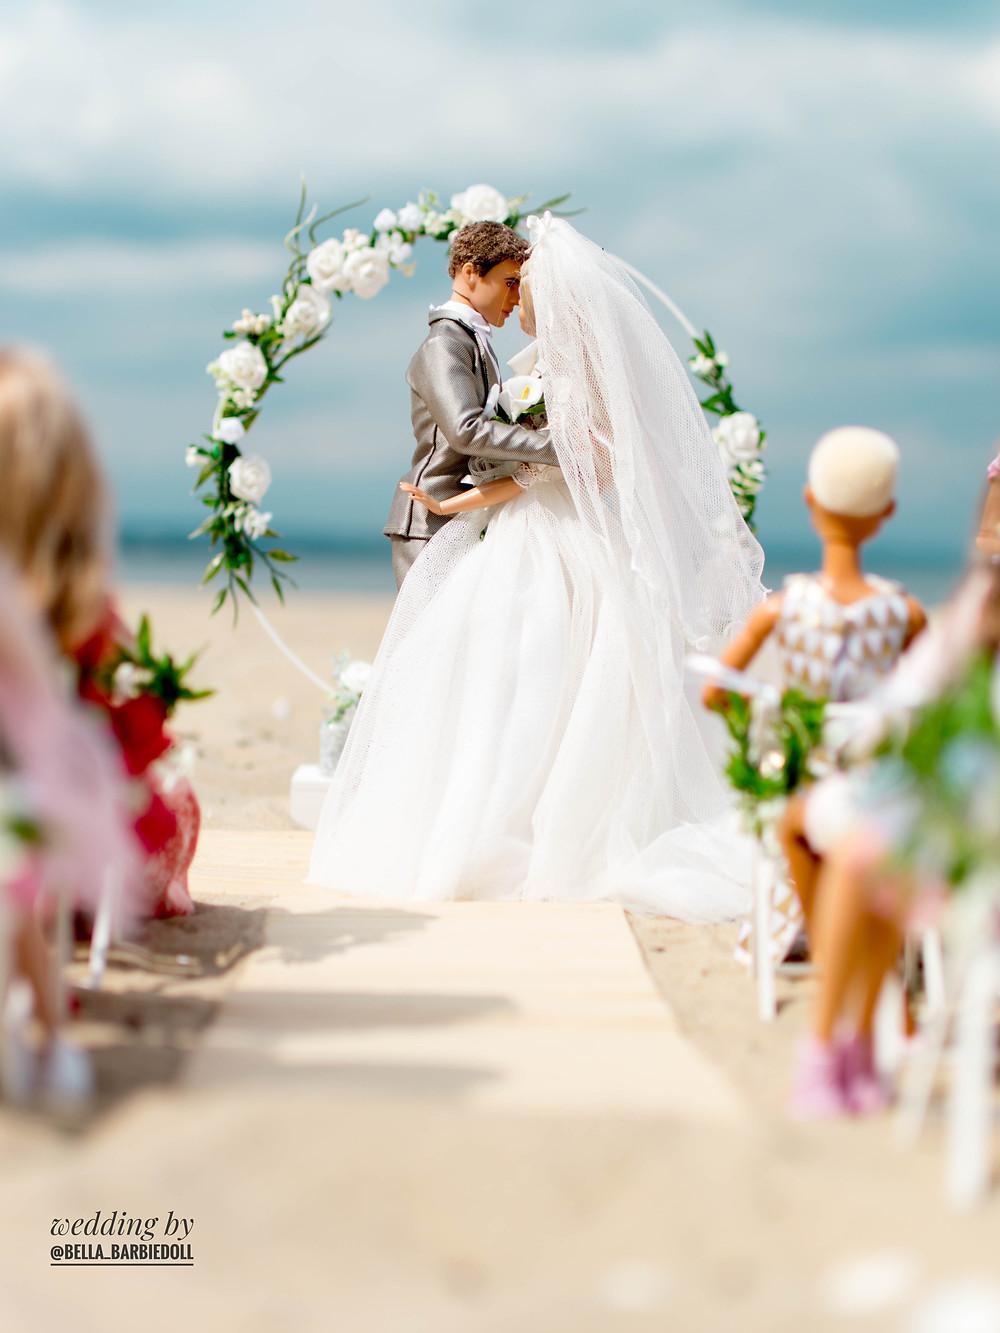 barbie and ken doll wedding photo